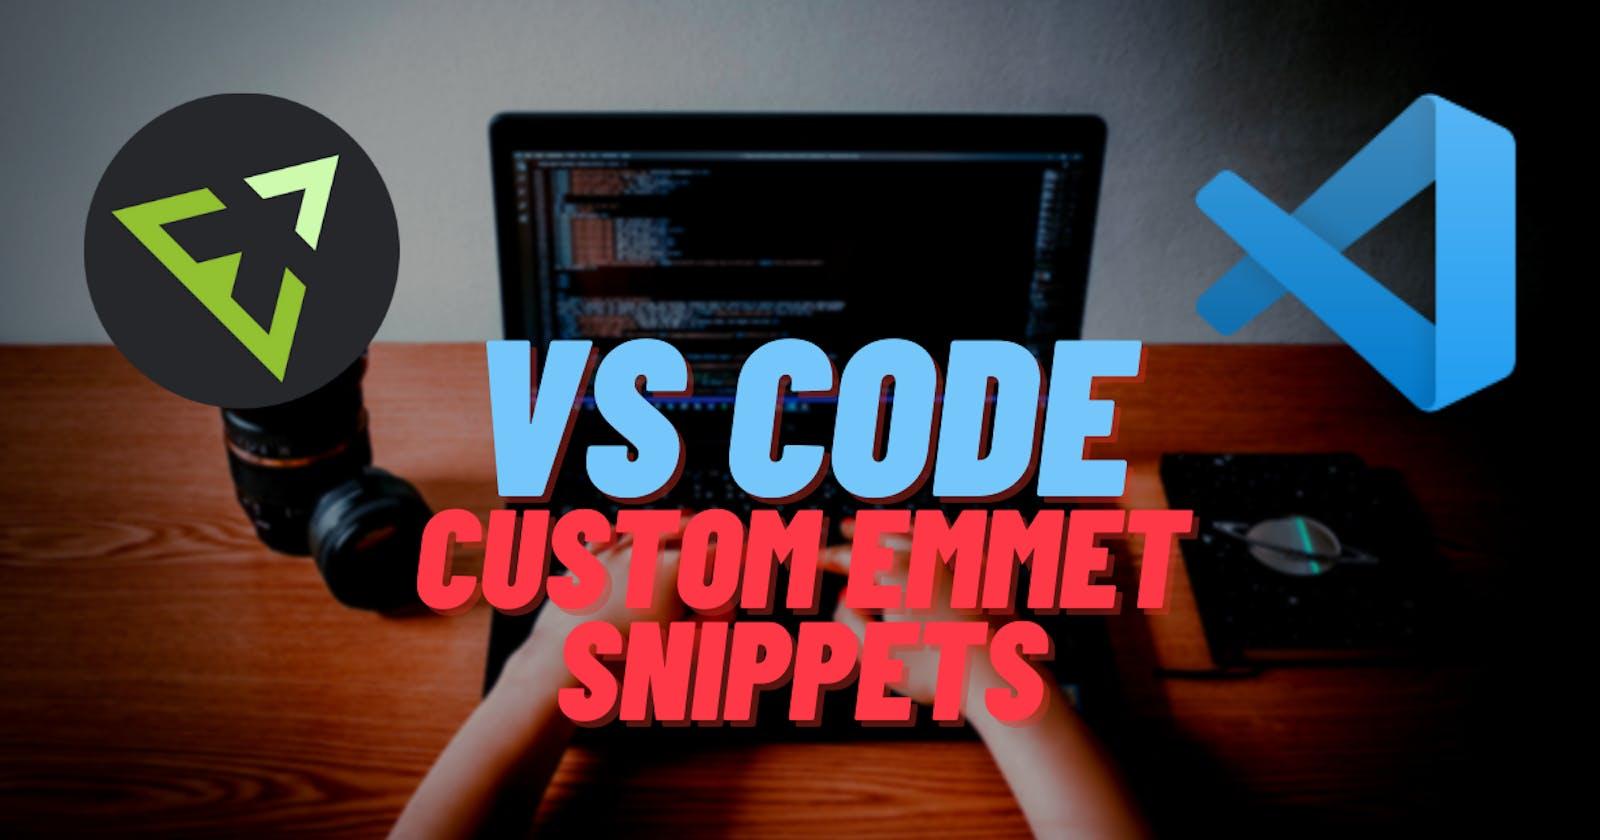 ✨ How to create Custom Emmet Snippets in VS Code!